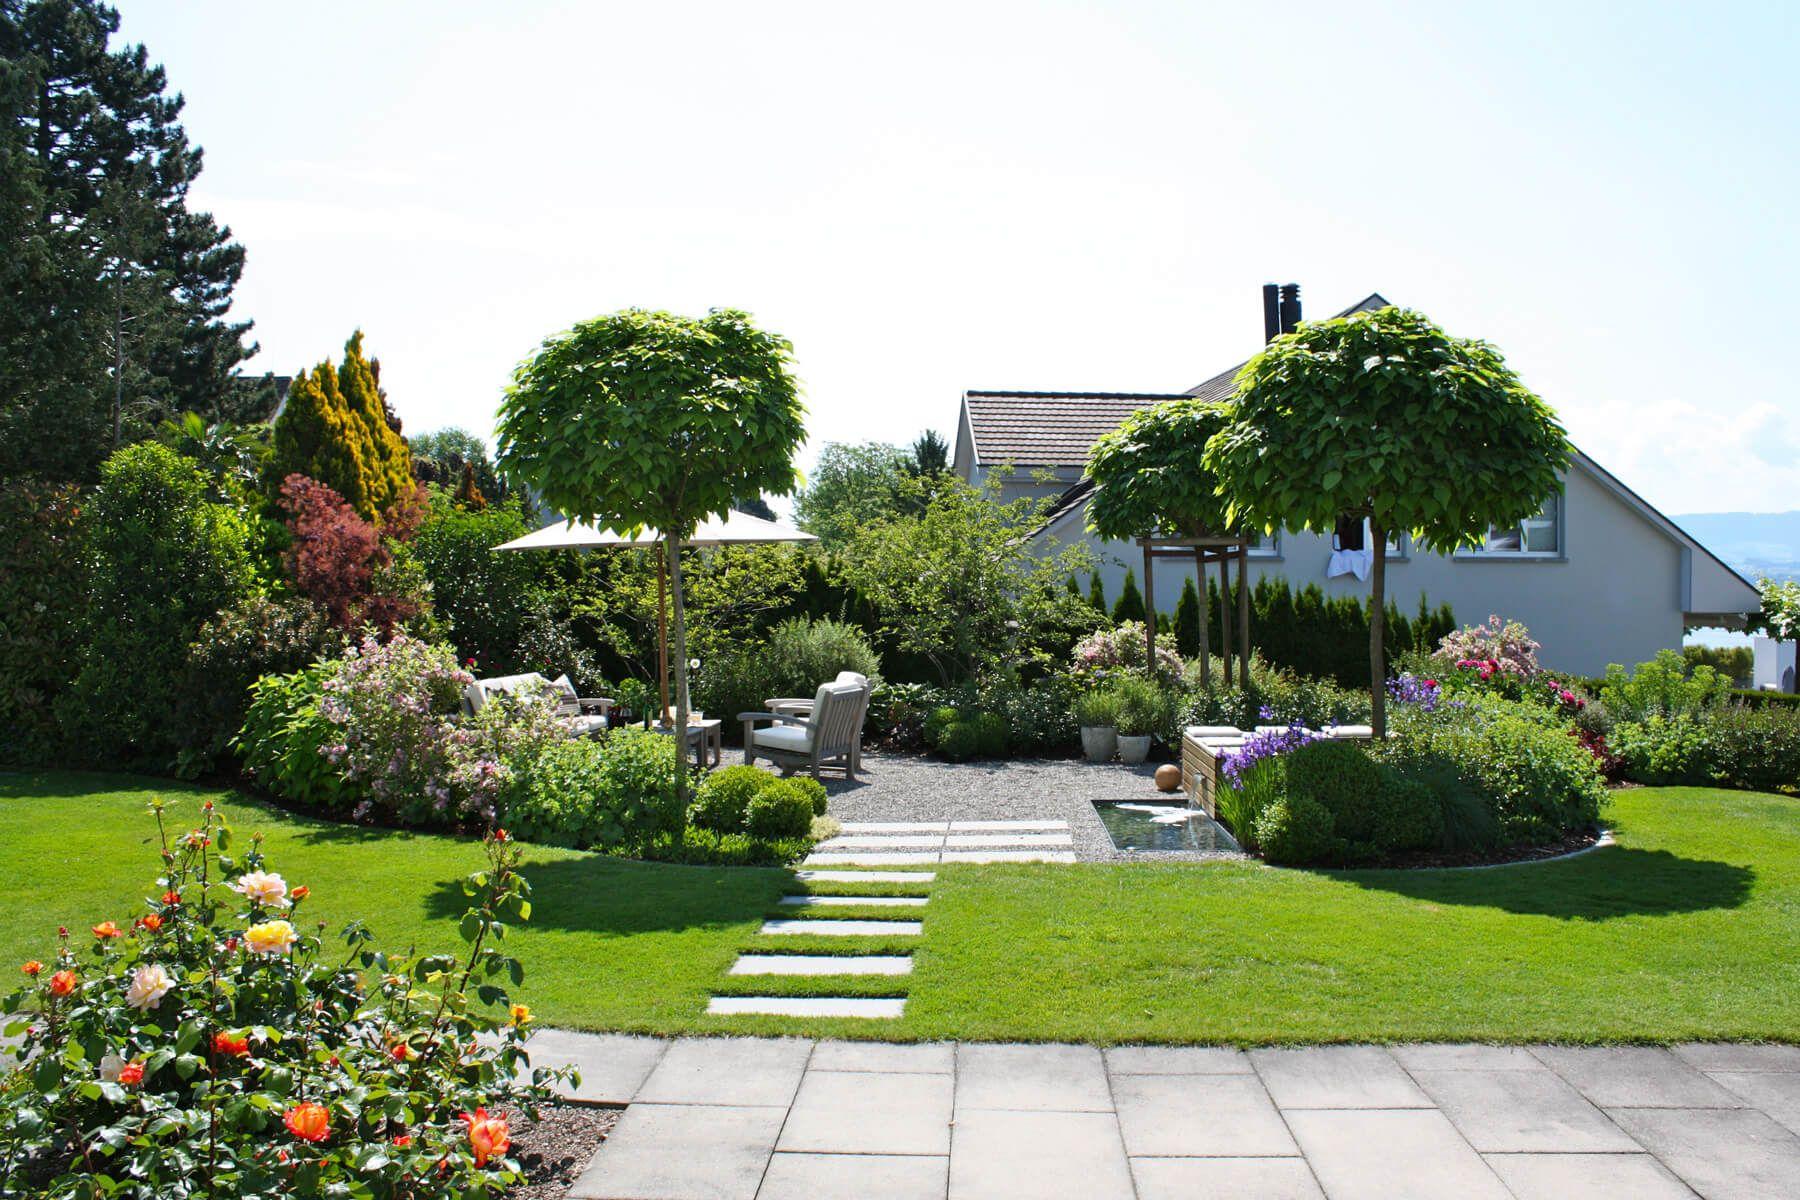 1c32da34feb4dcfdceecf7fe3b54cc61 Tolle Gartengestaltung Ideen Vorgarten Konzept